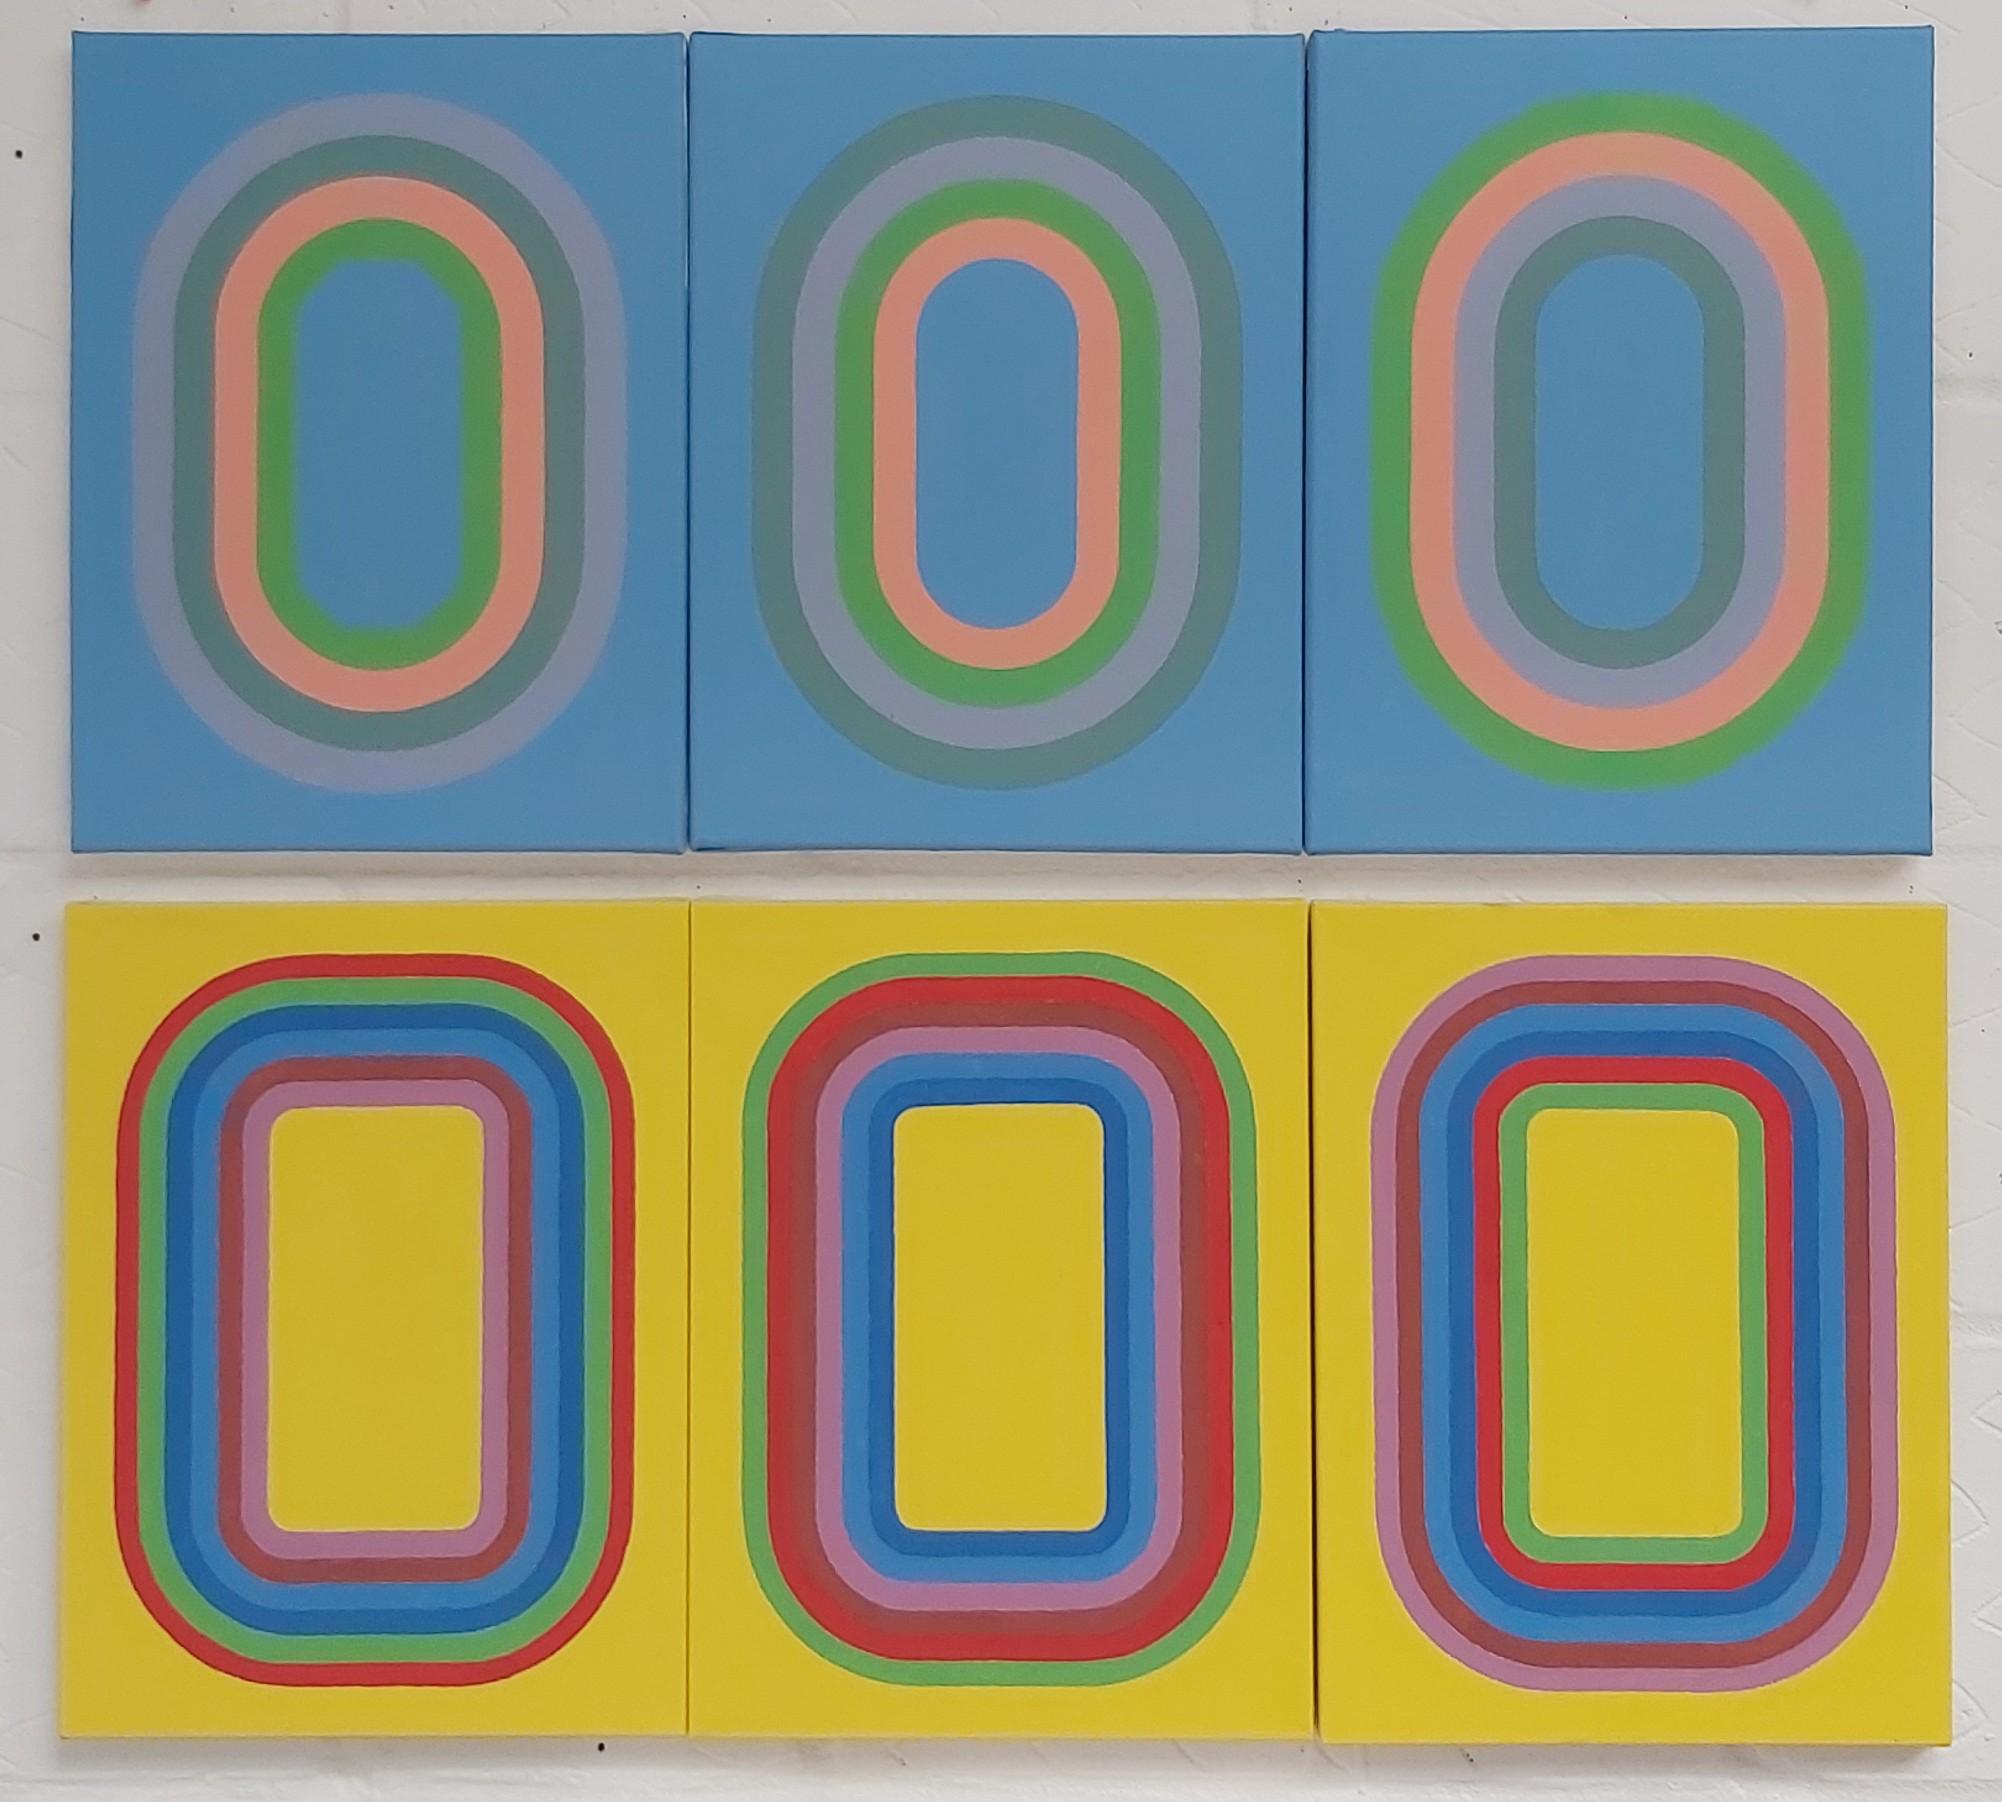 Shubbak (Triptych 1 & 2) 2020 Acrylic on Canvas 40 x 30 cm x 6